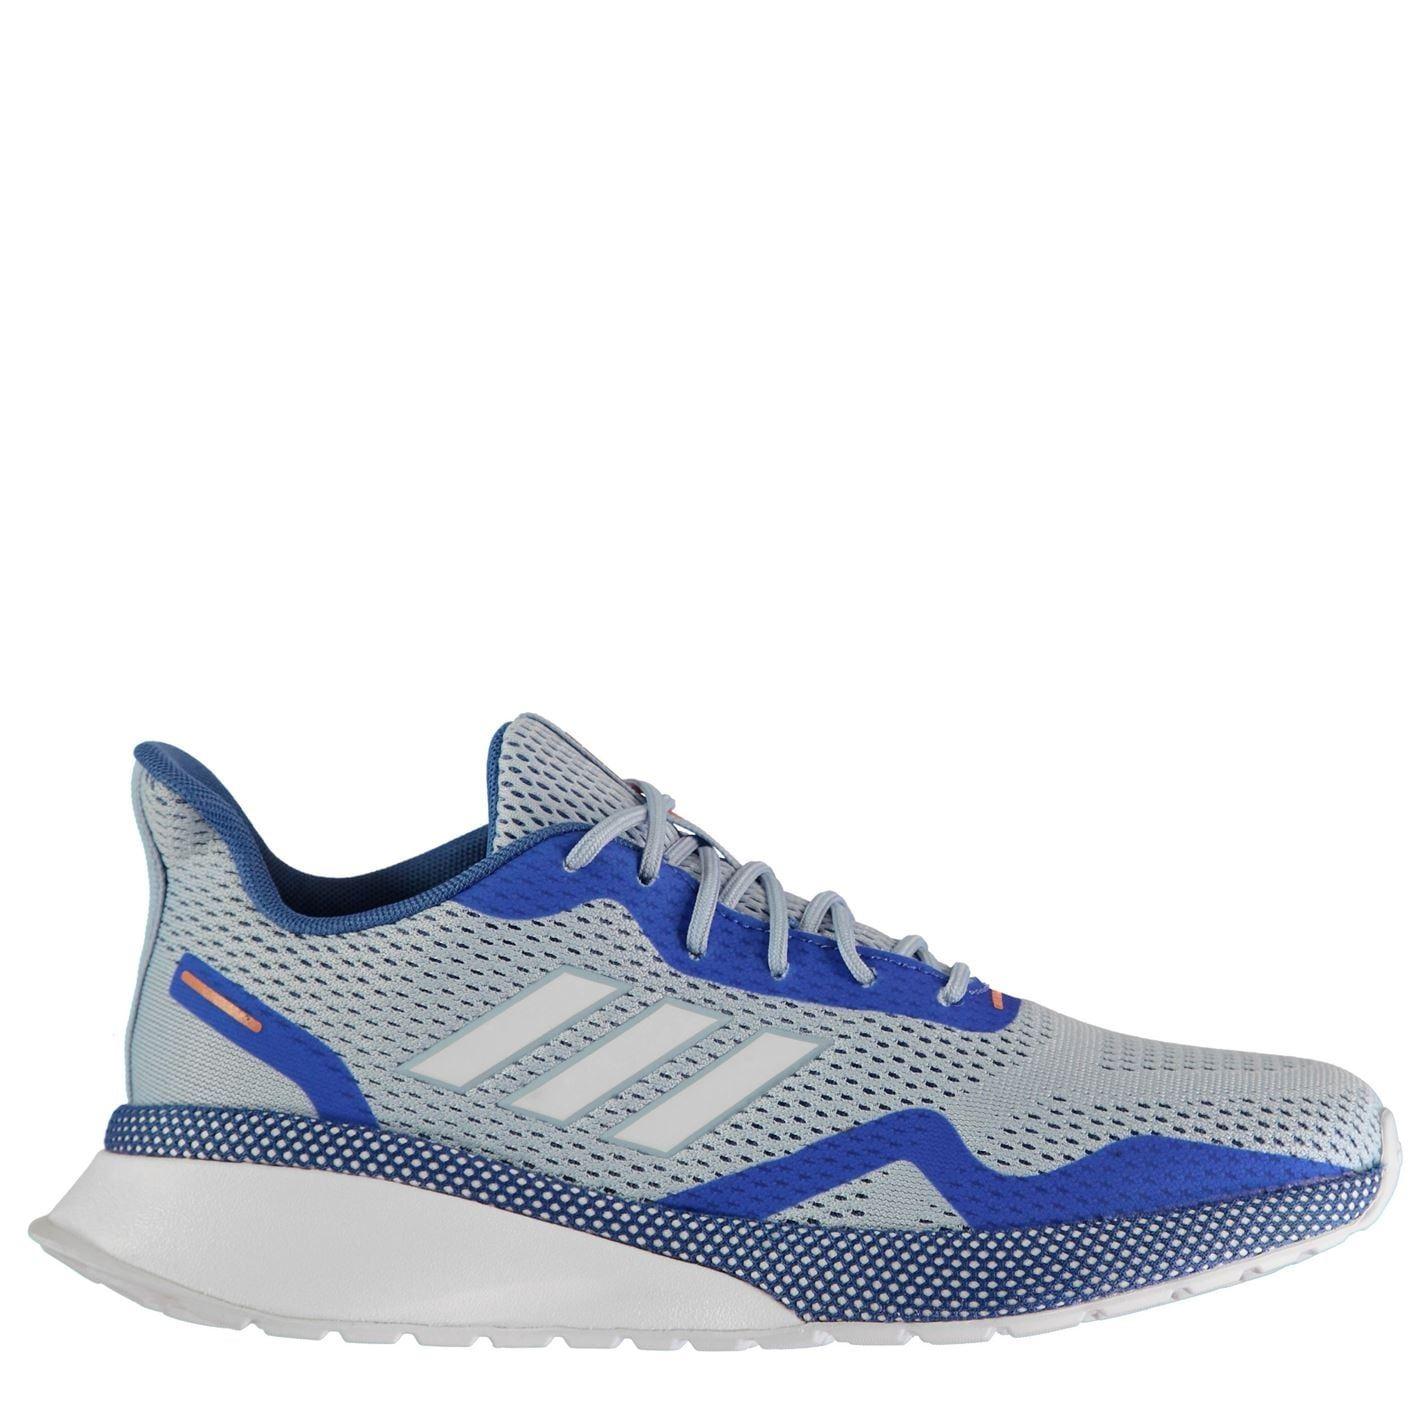 adidas Nova Fuse X Ladies Running Shoes